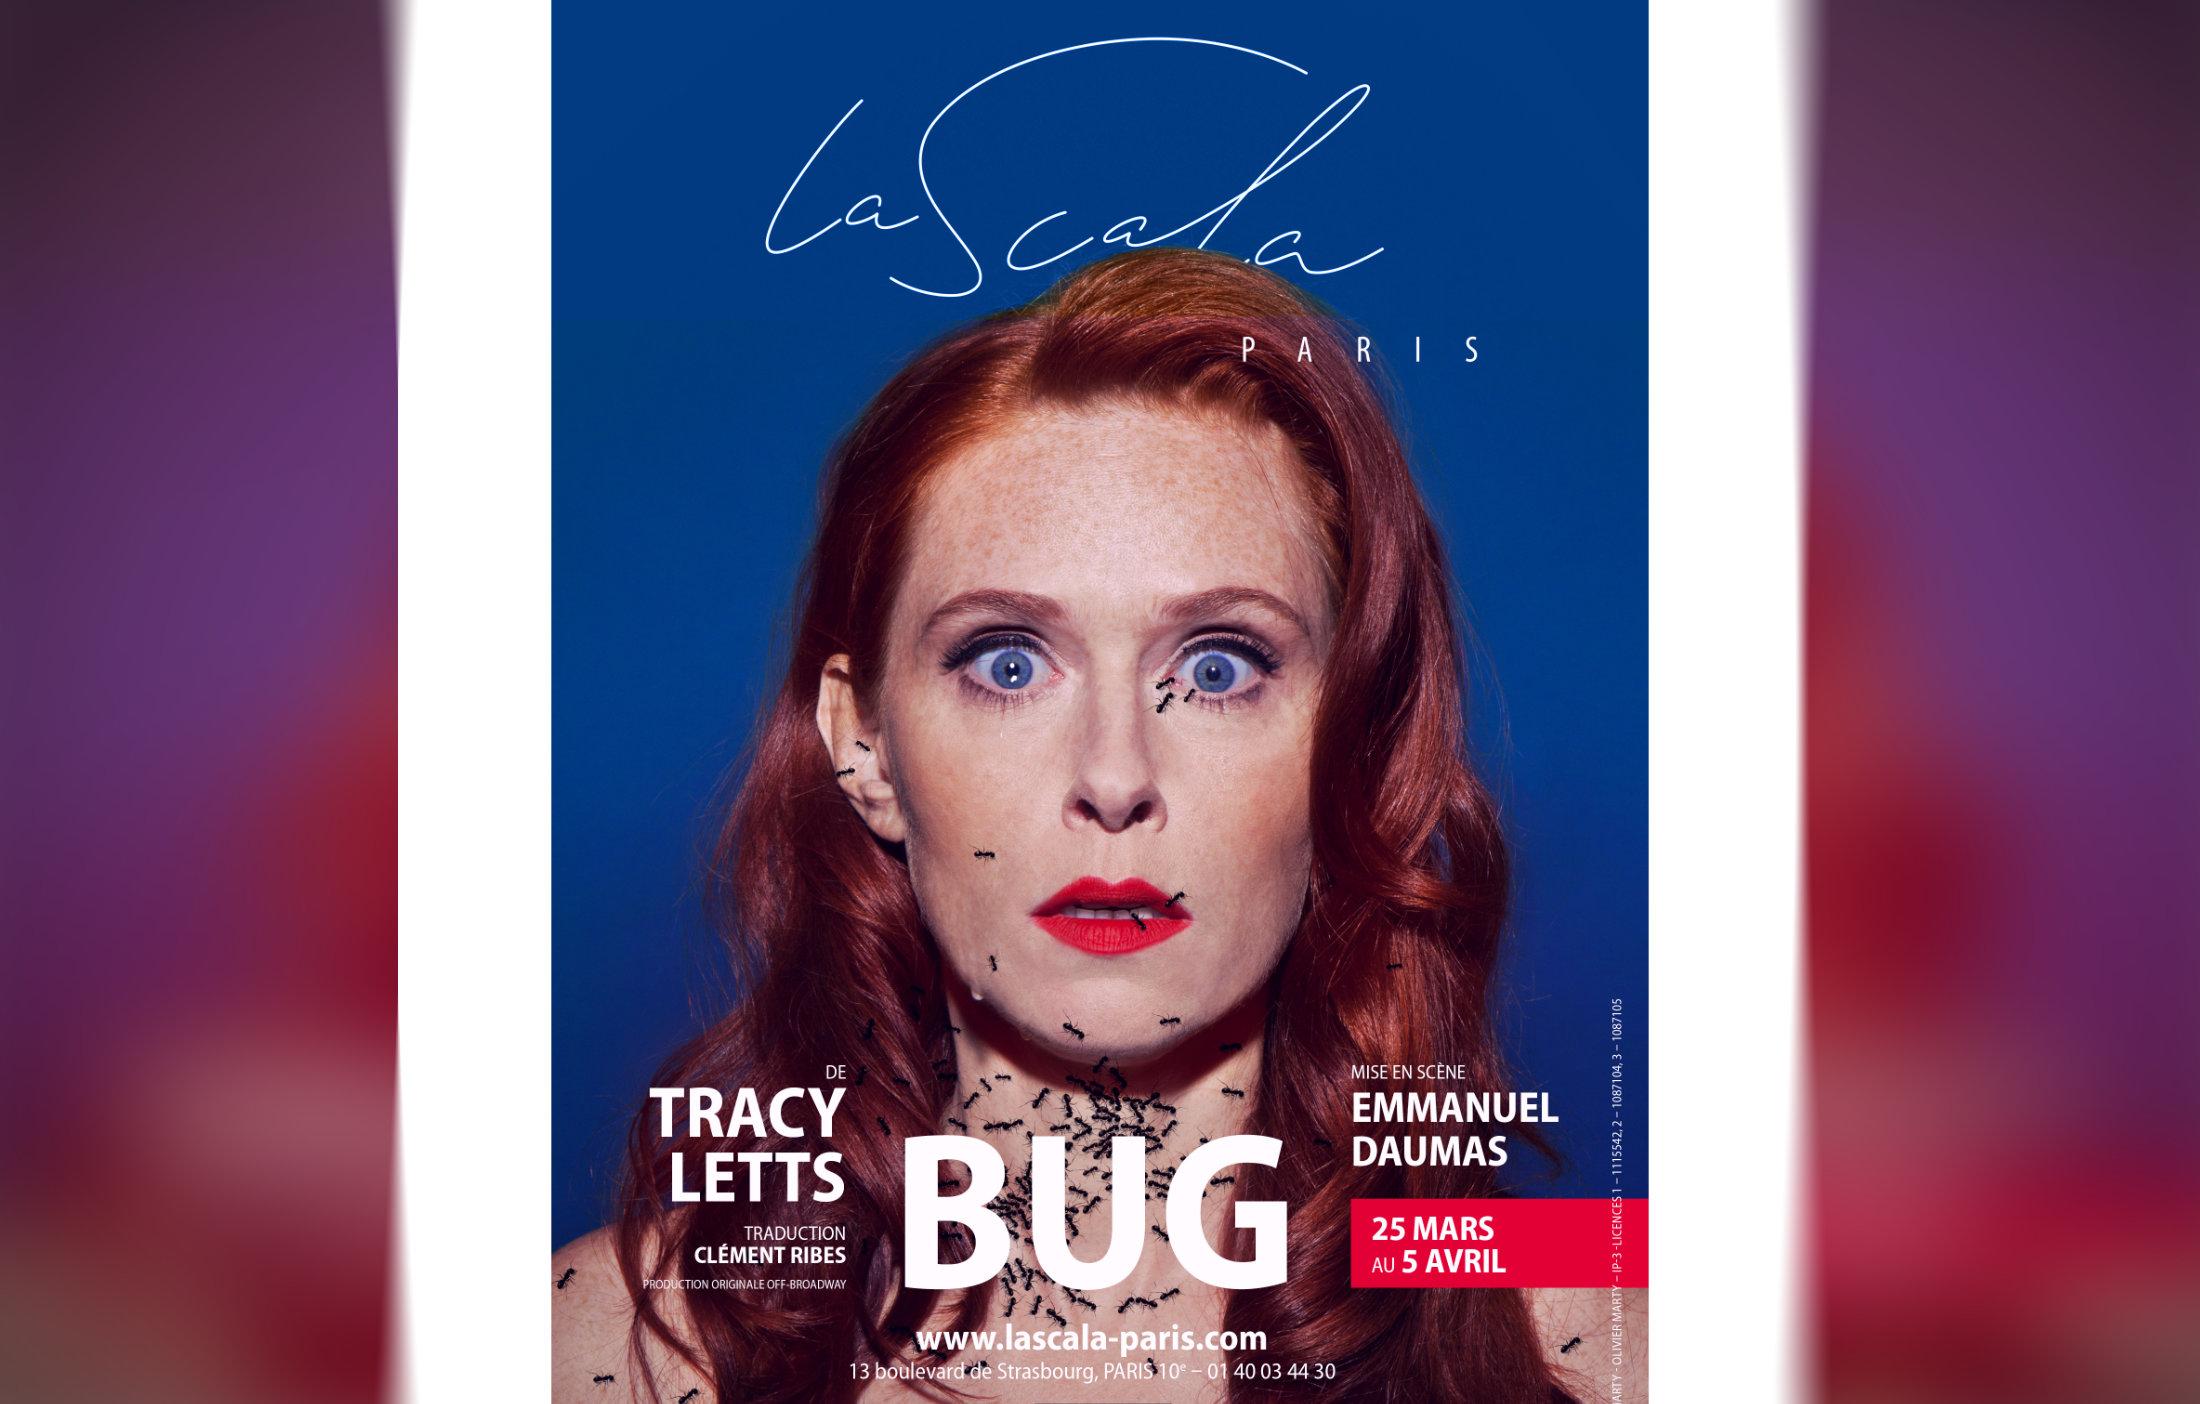 BUG-de-Tracy-Letts@2x